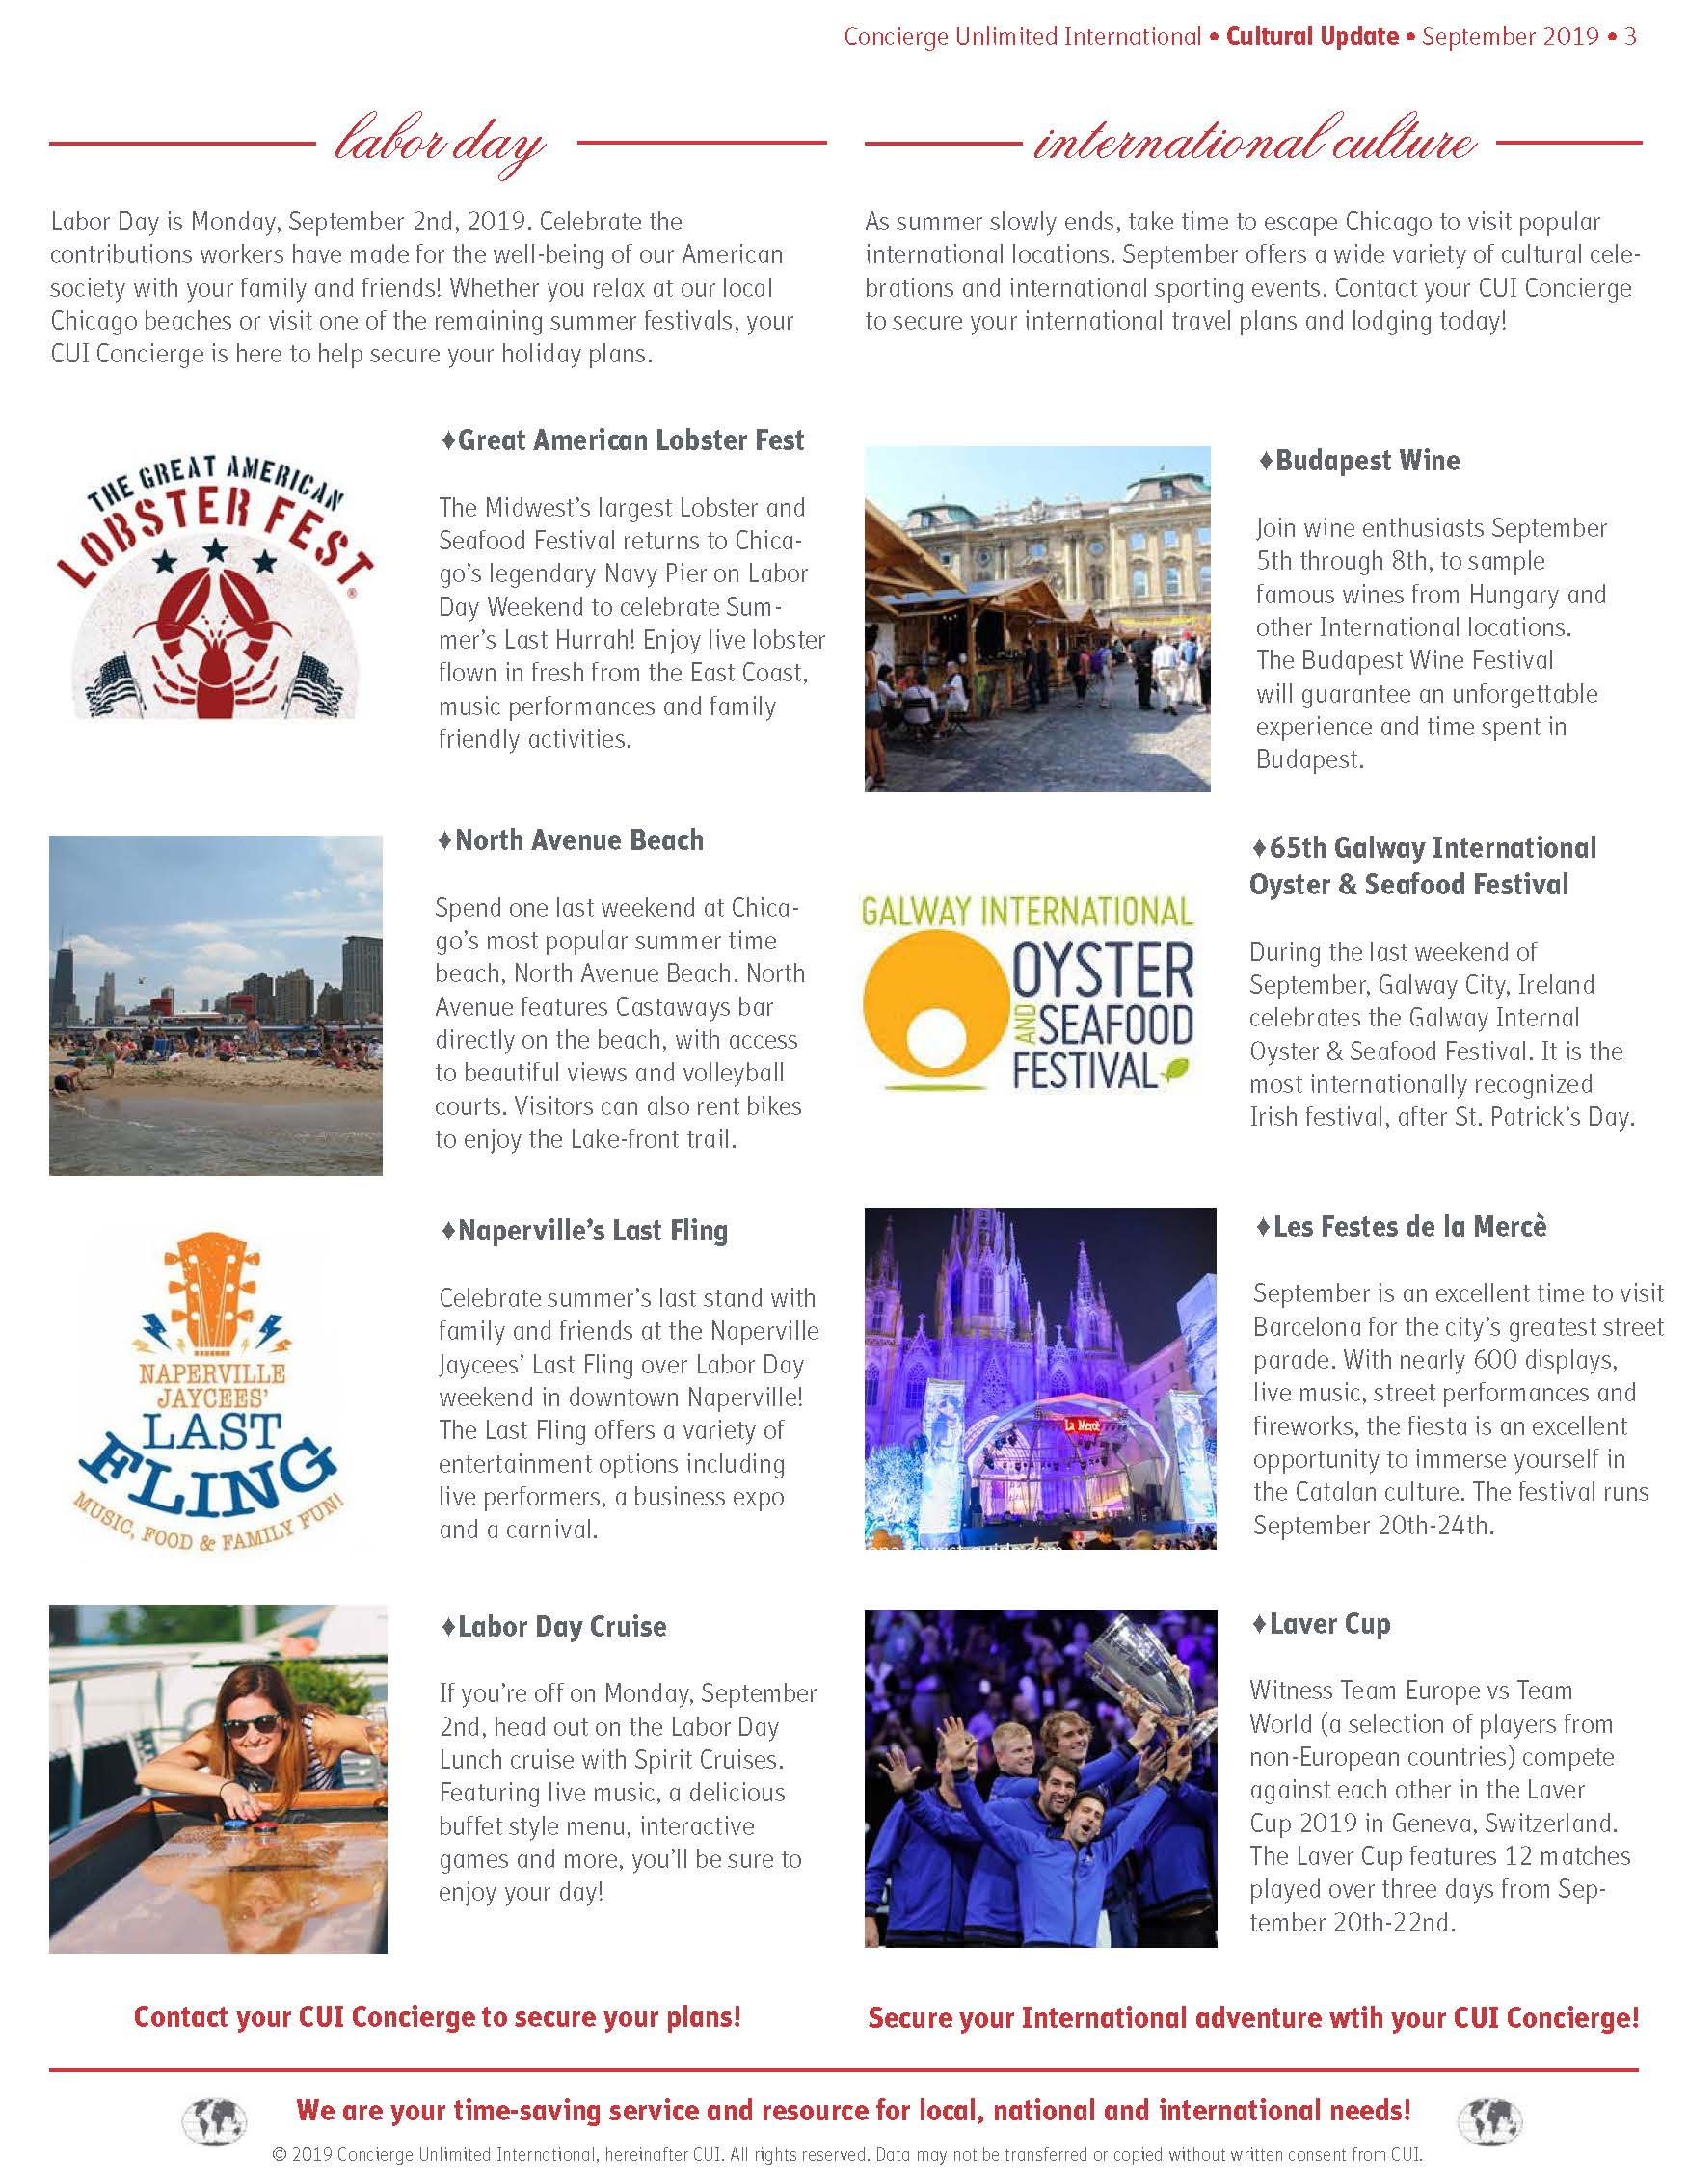 September Cultural Update_Page_3.jpg